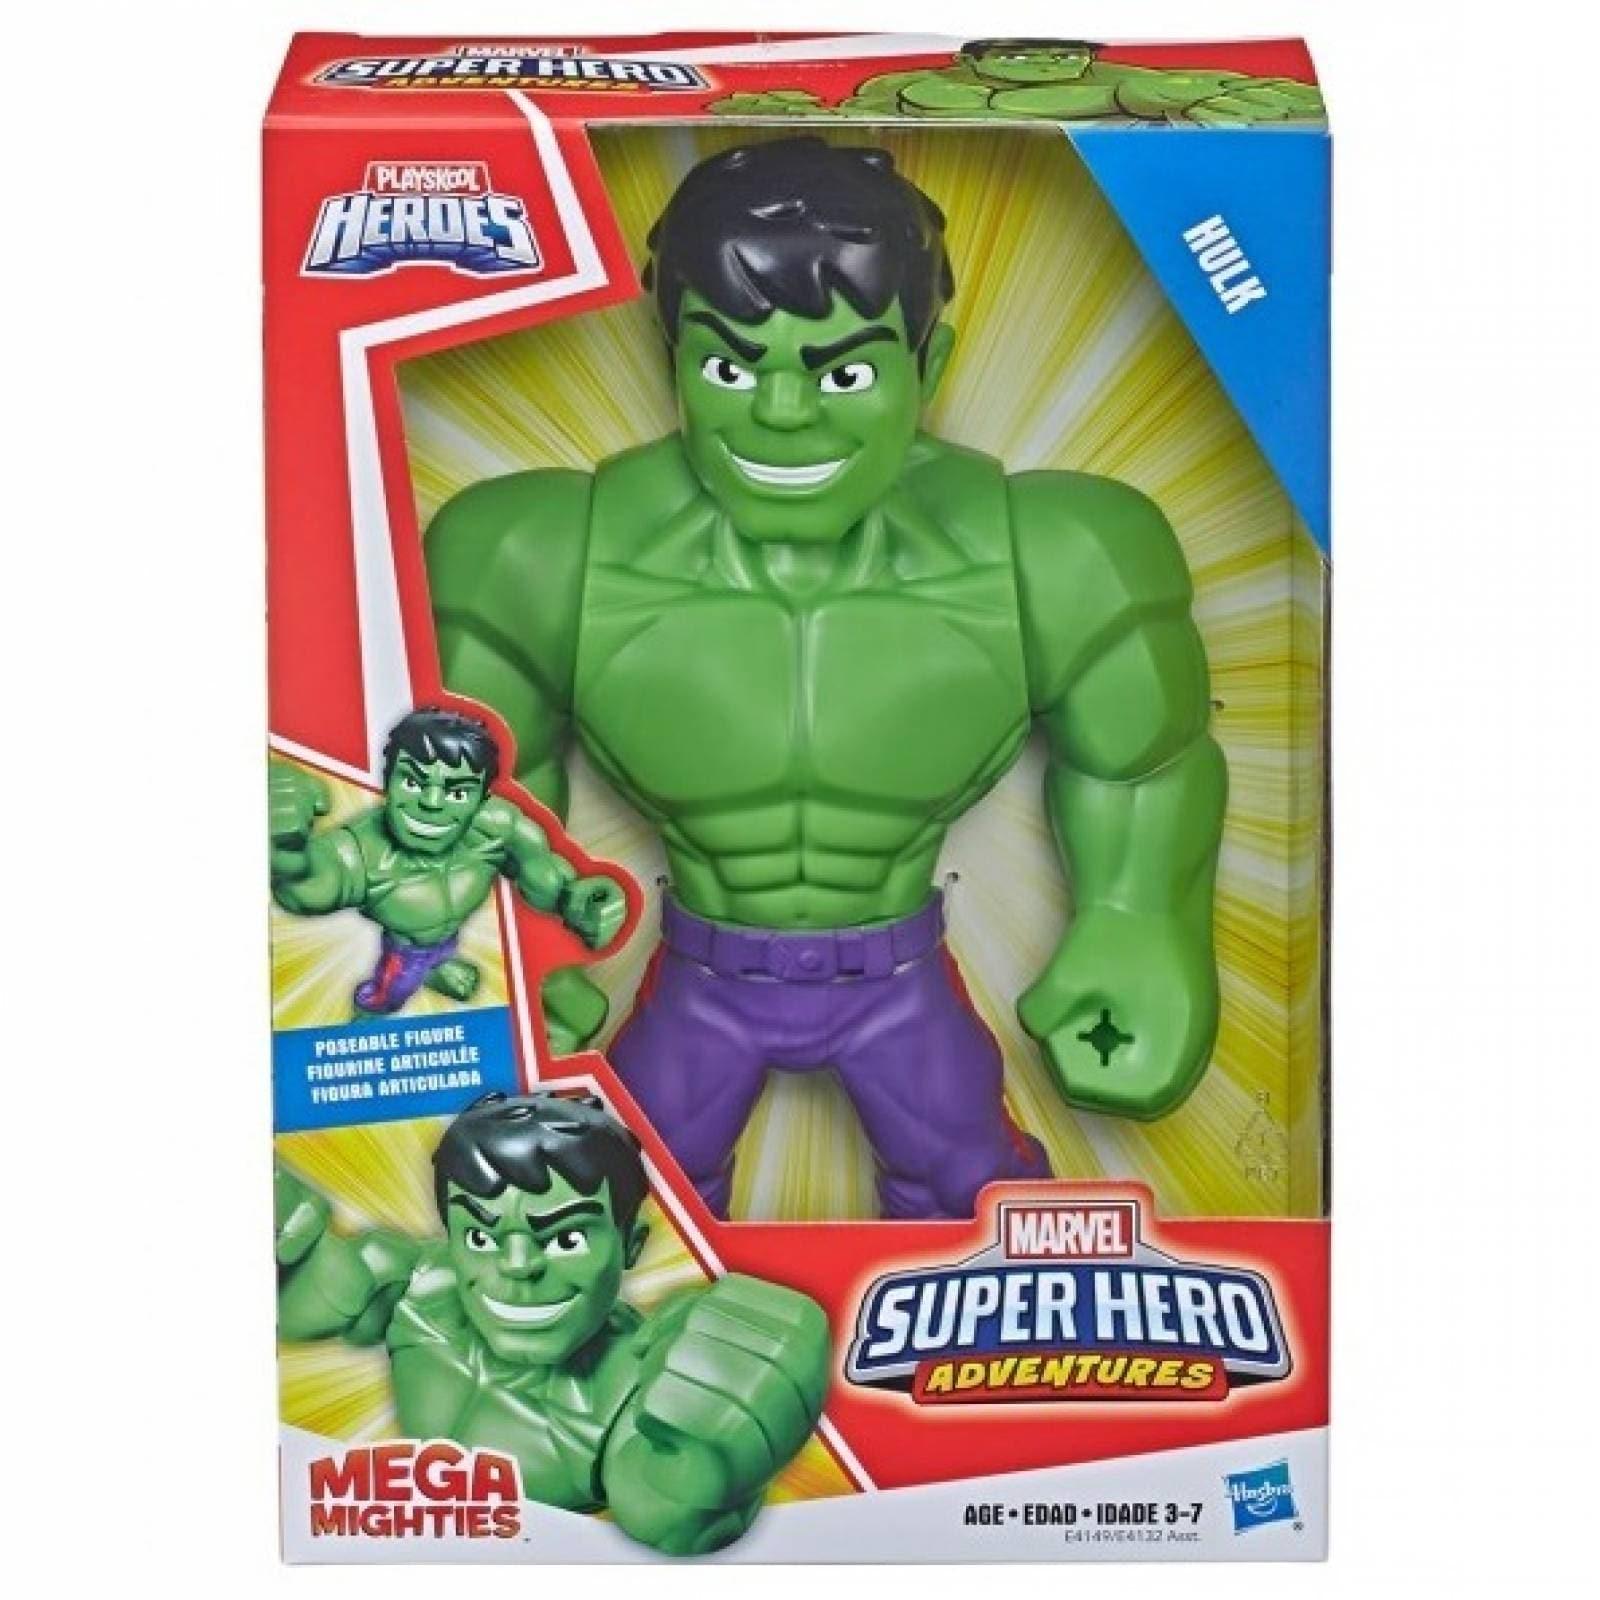 SUPER HERO ADVENTURES MEGA MIGHTIES HULK